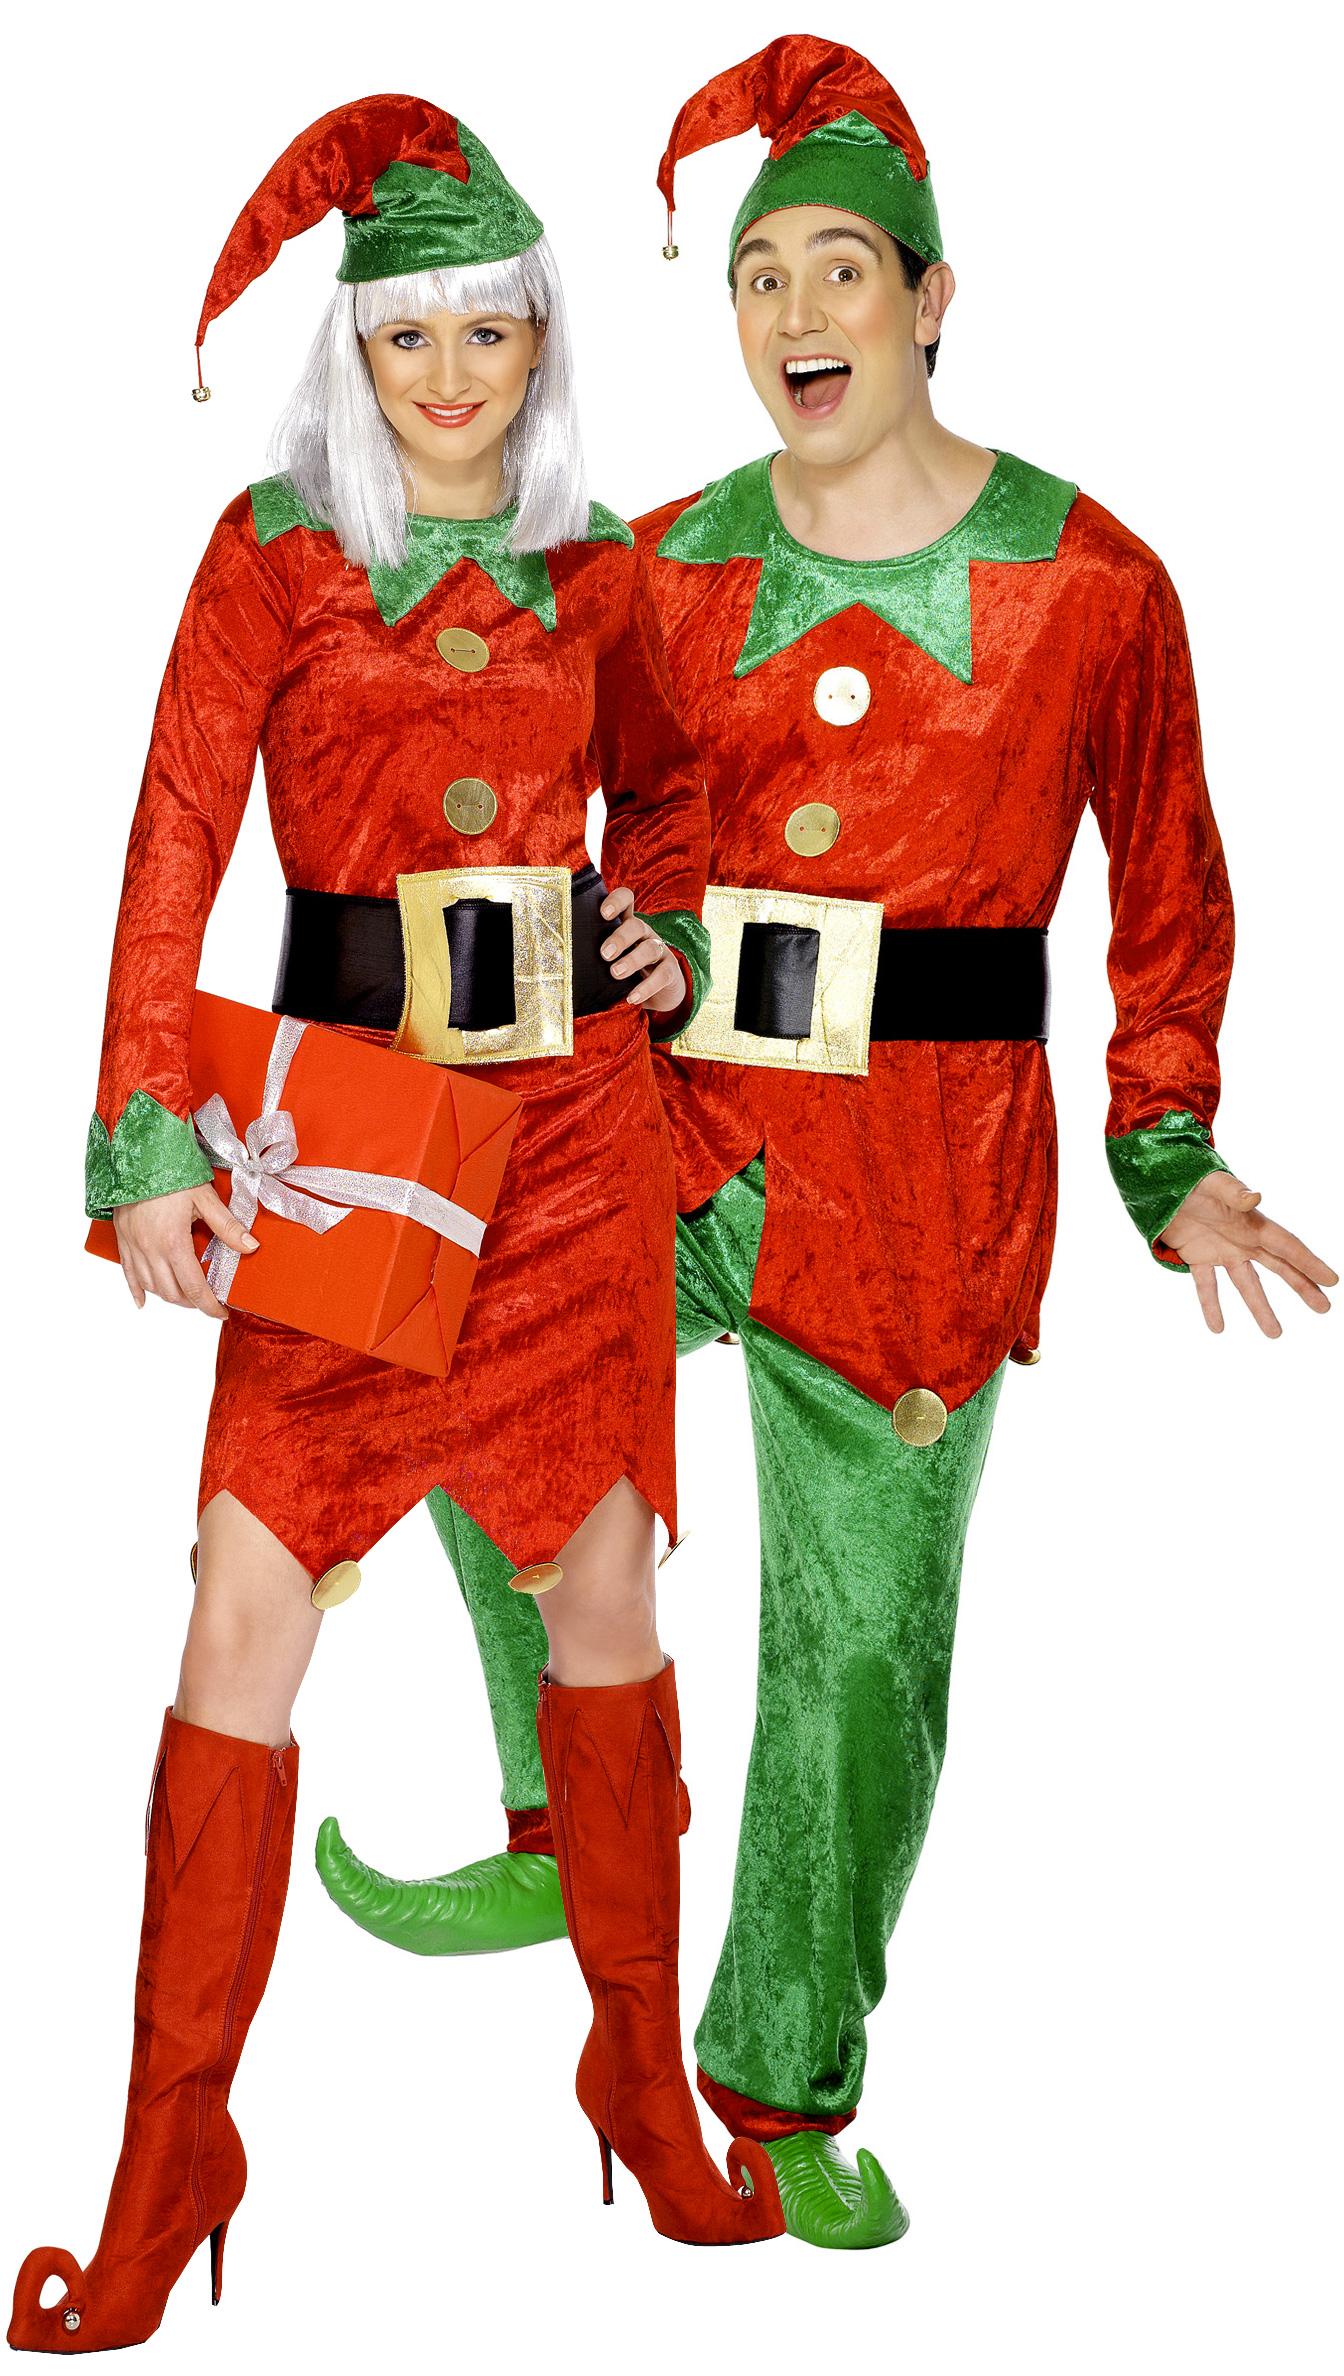 Disfraz de pareja de duendes de navidad disfraces - Disfraces de navidad originales ...